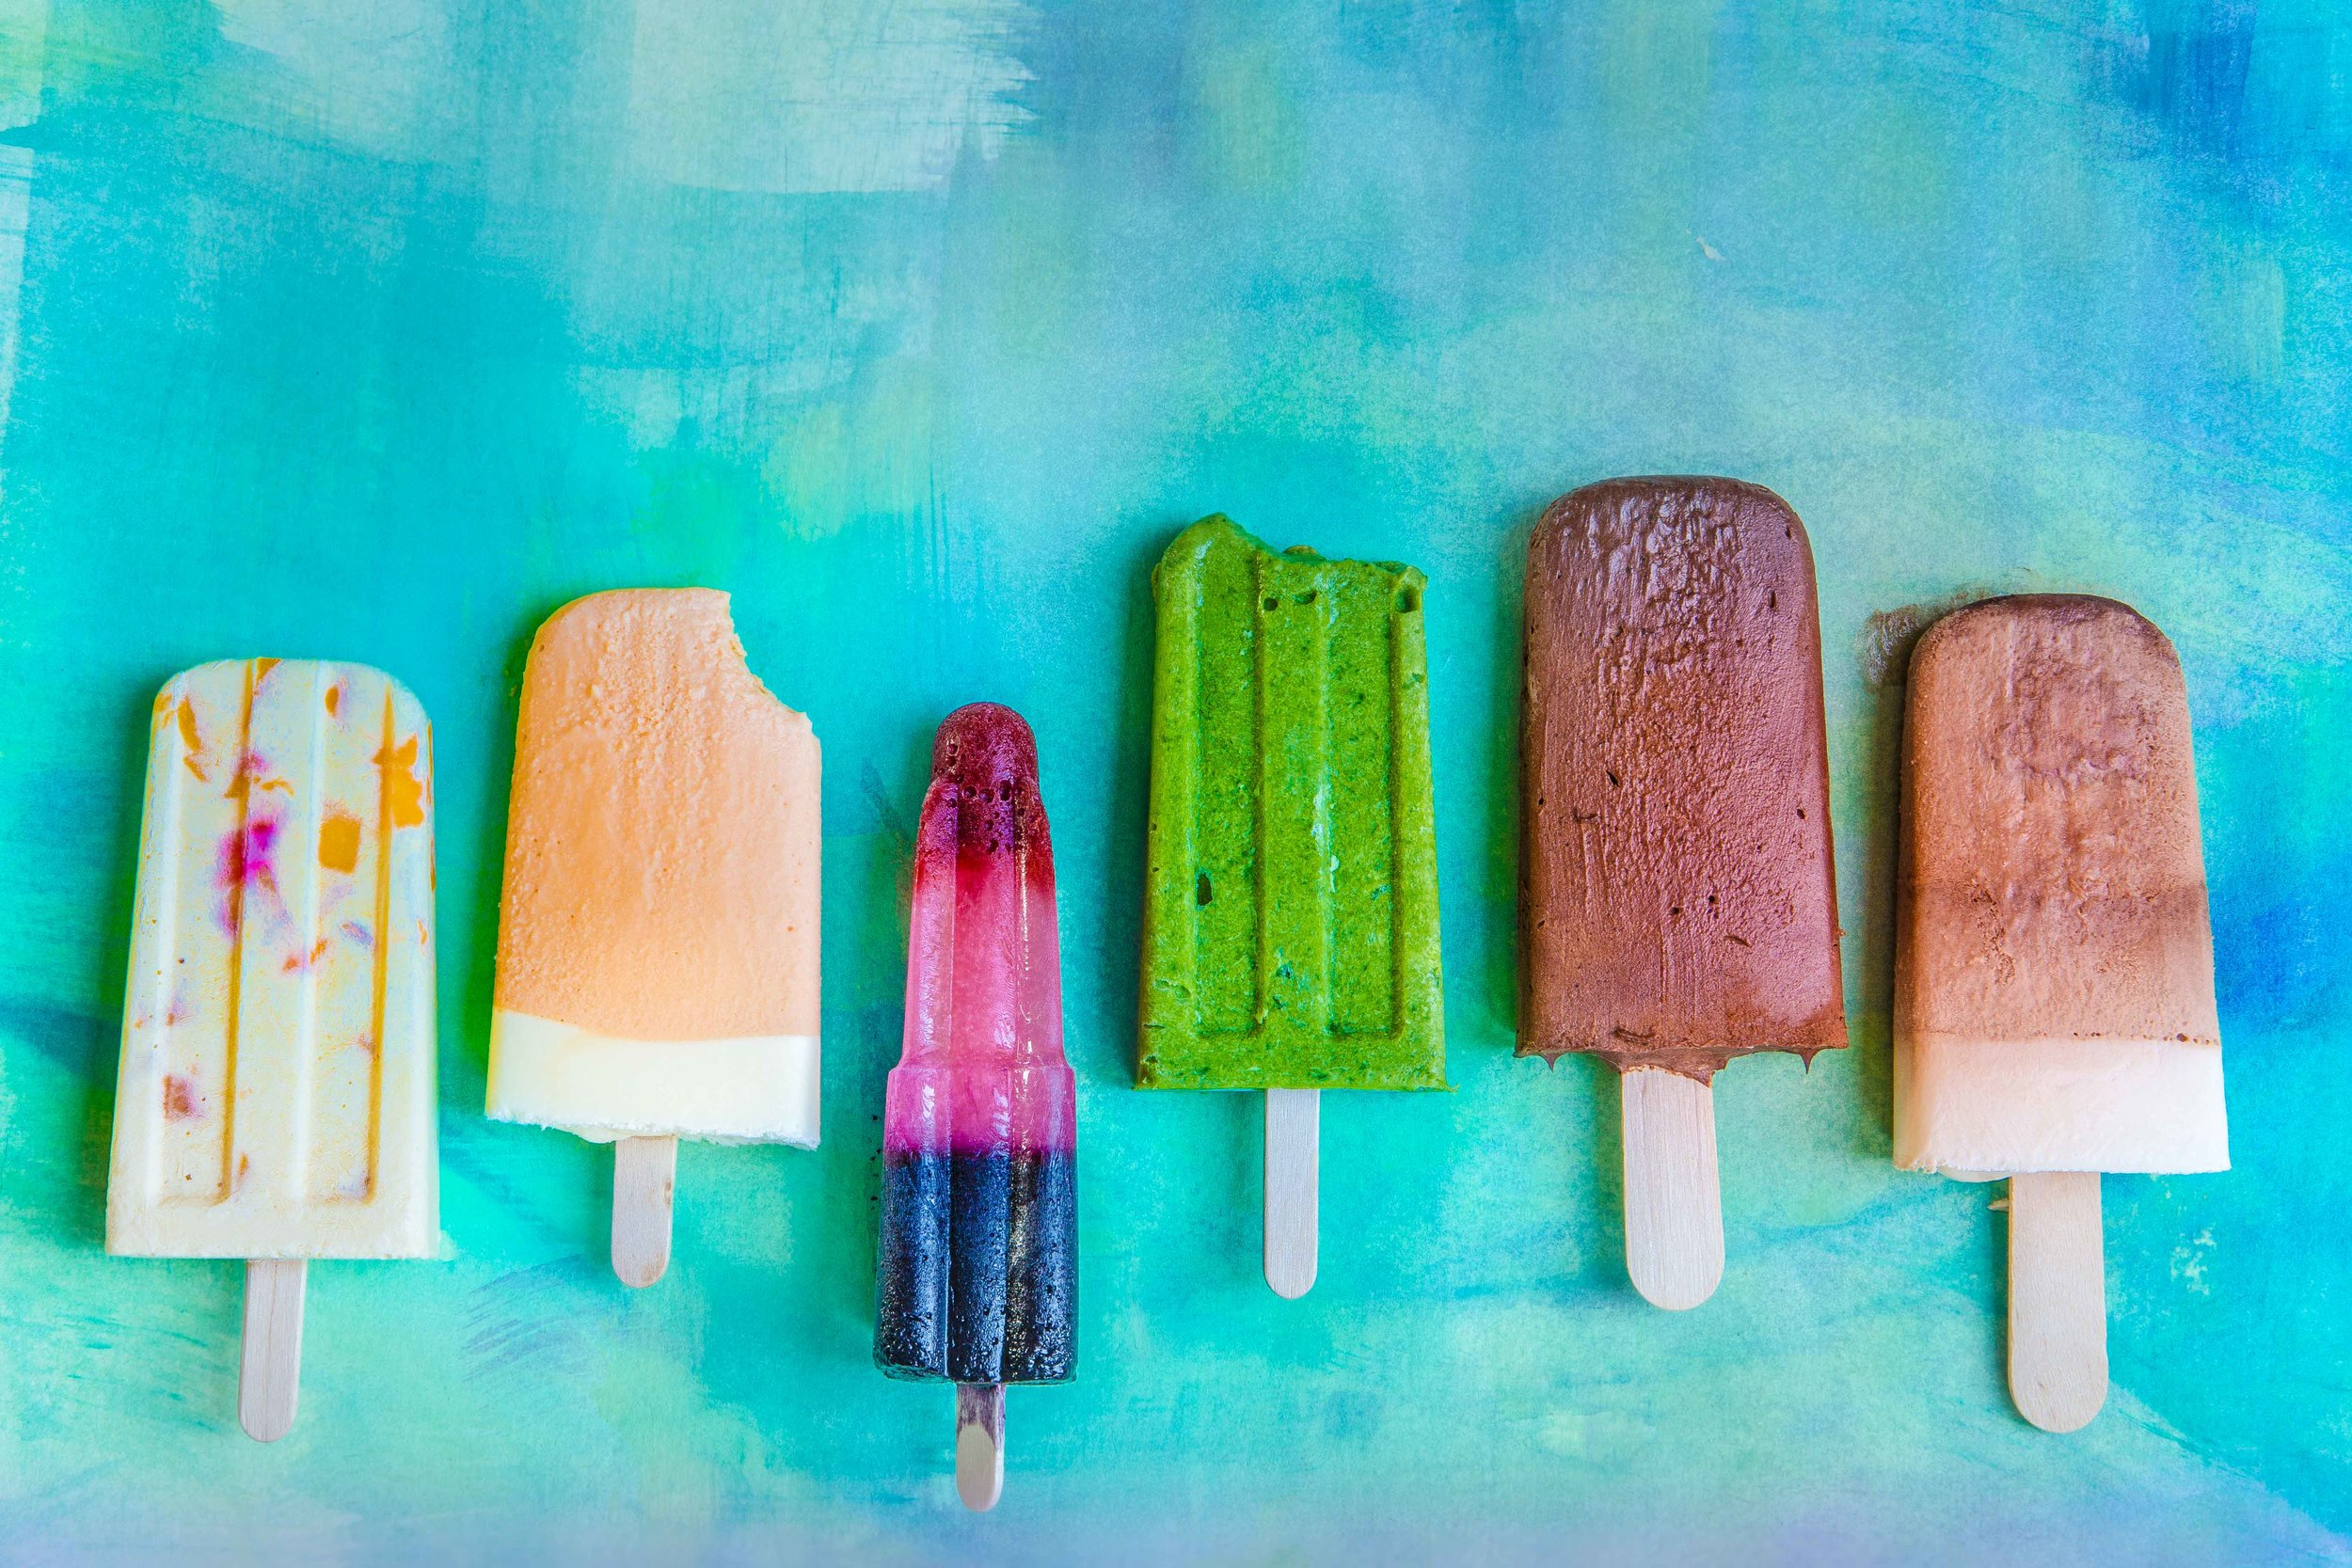 Popsicles 6 flavors (photo2).jpg